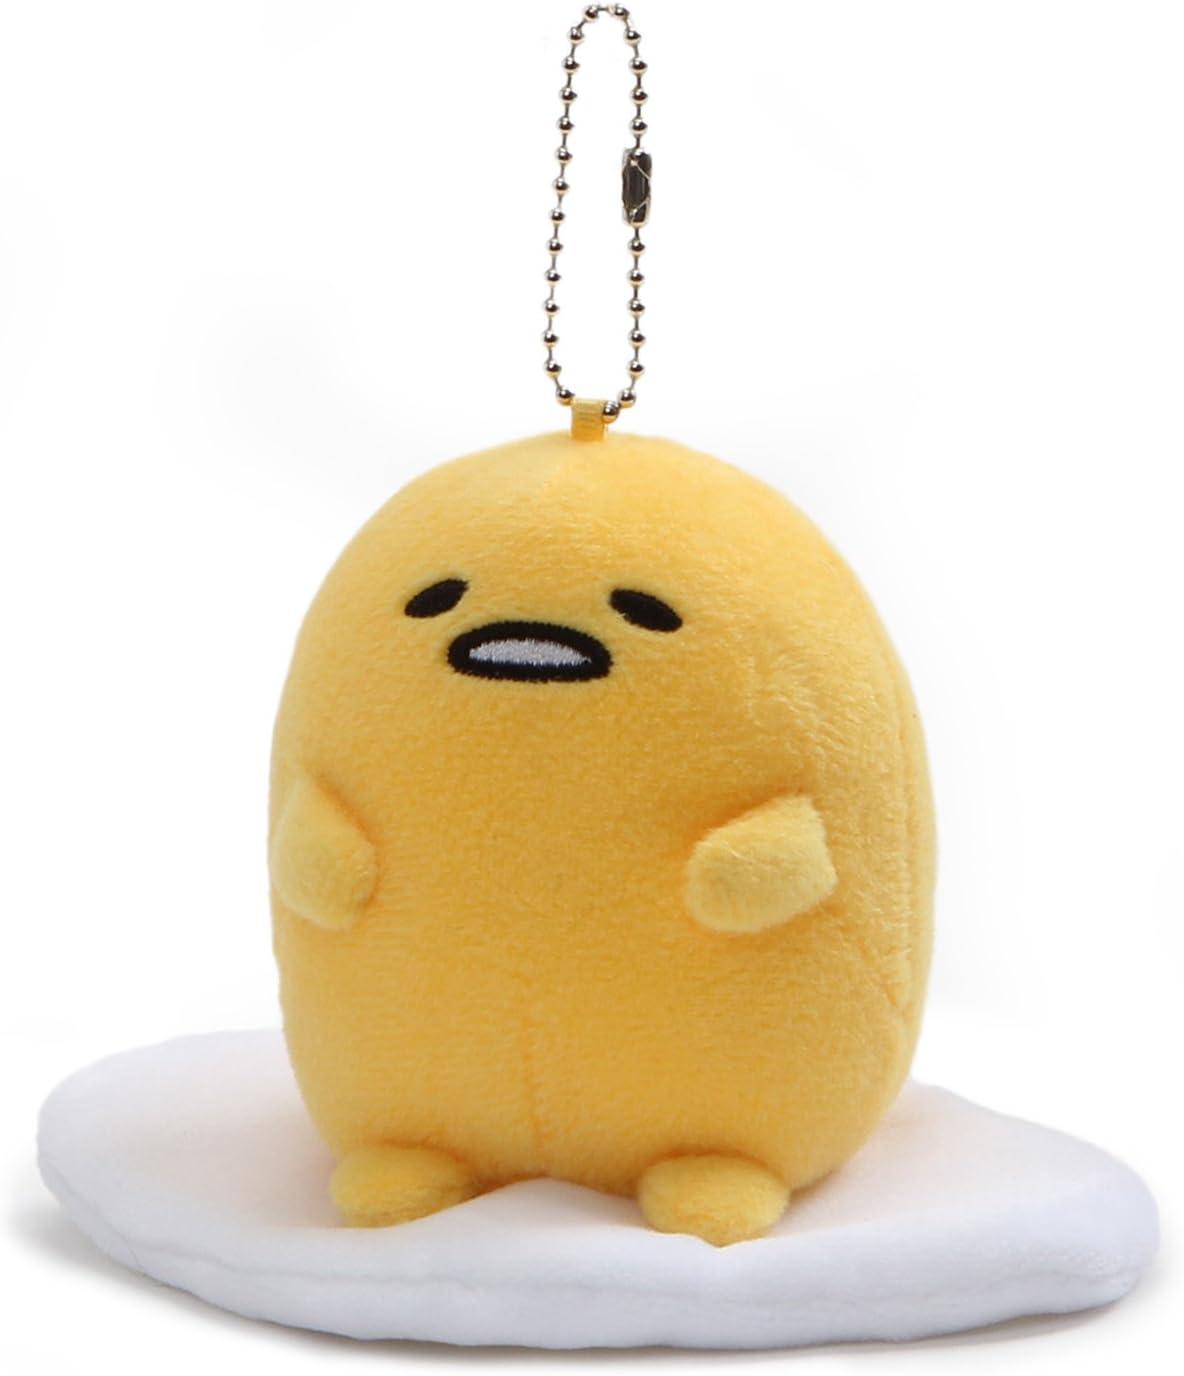 "GUND Gudetama ""Lazy Sitting Pose"" Stuffed Animal Plush Keychain, 5"